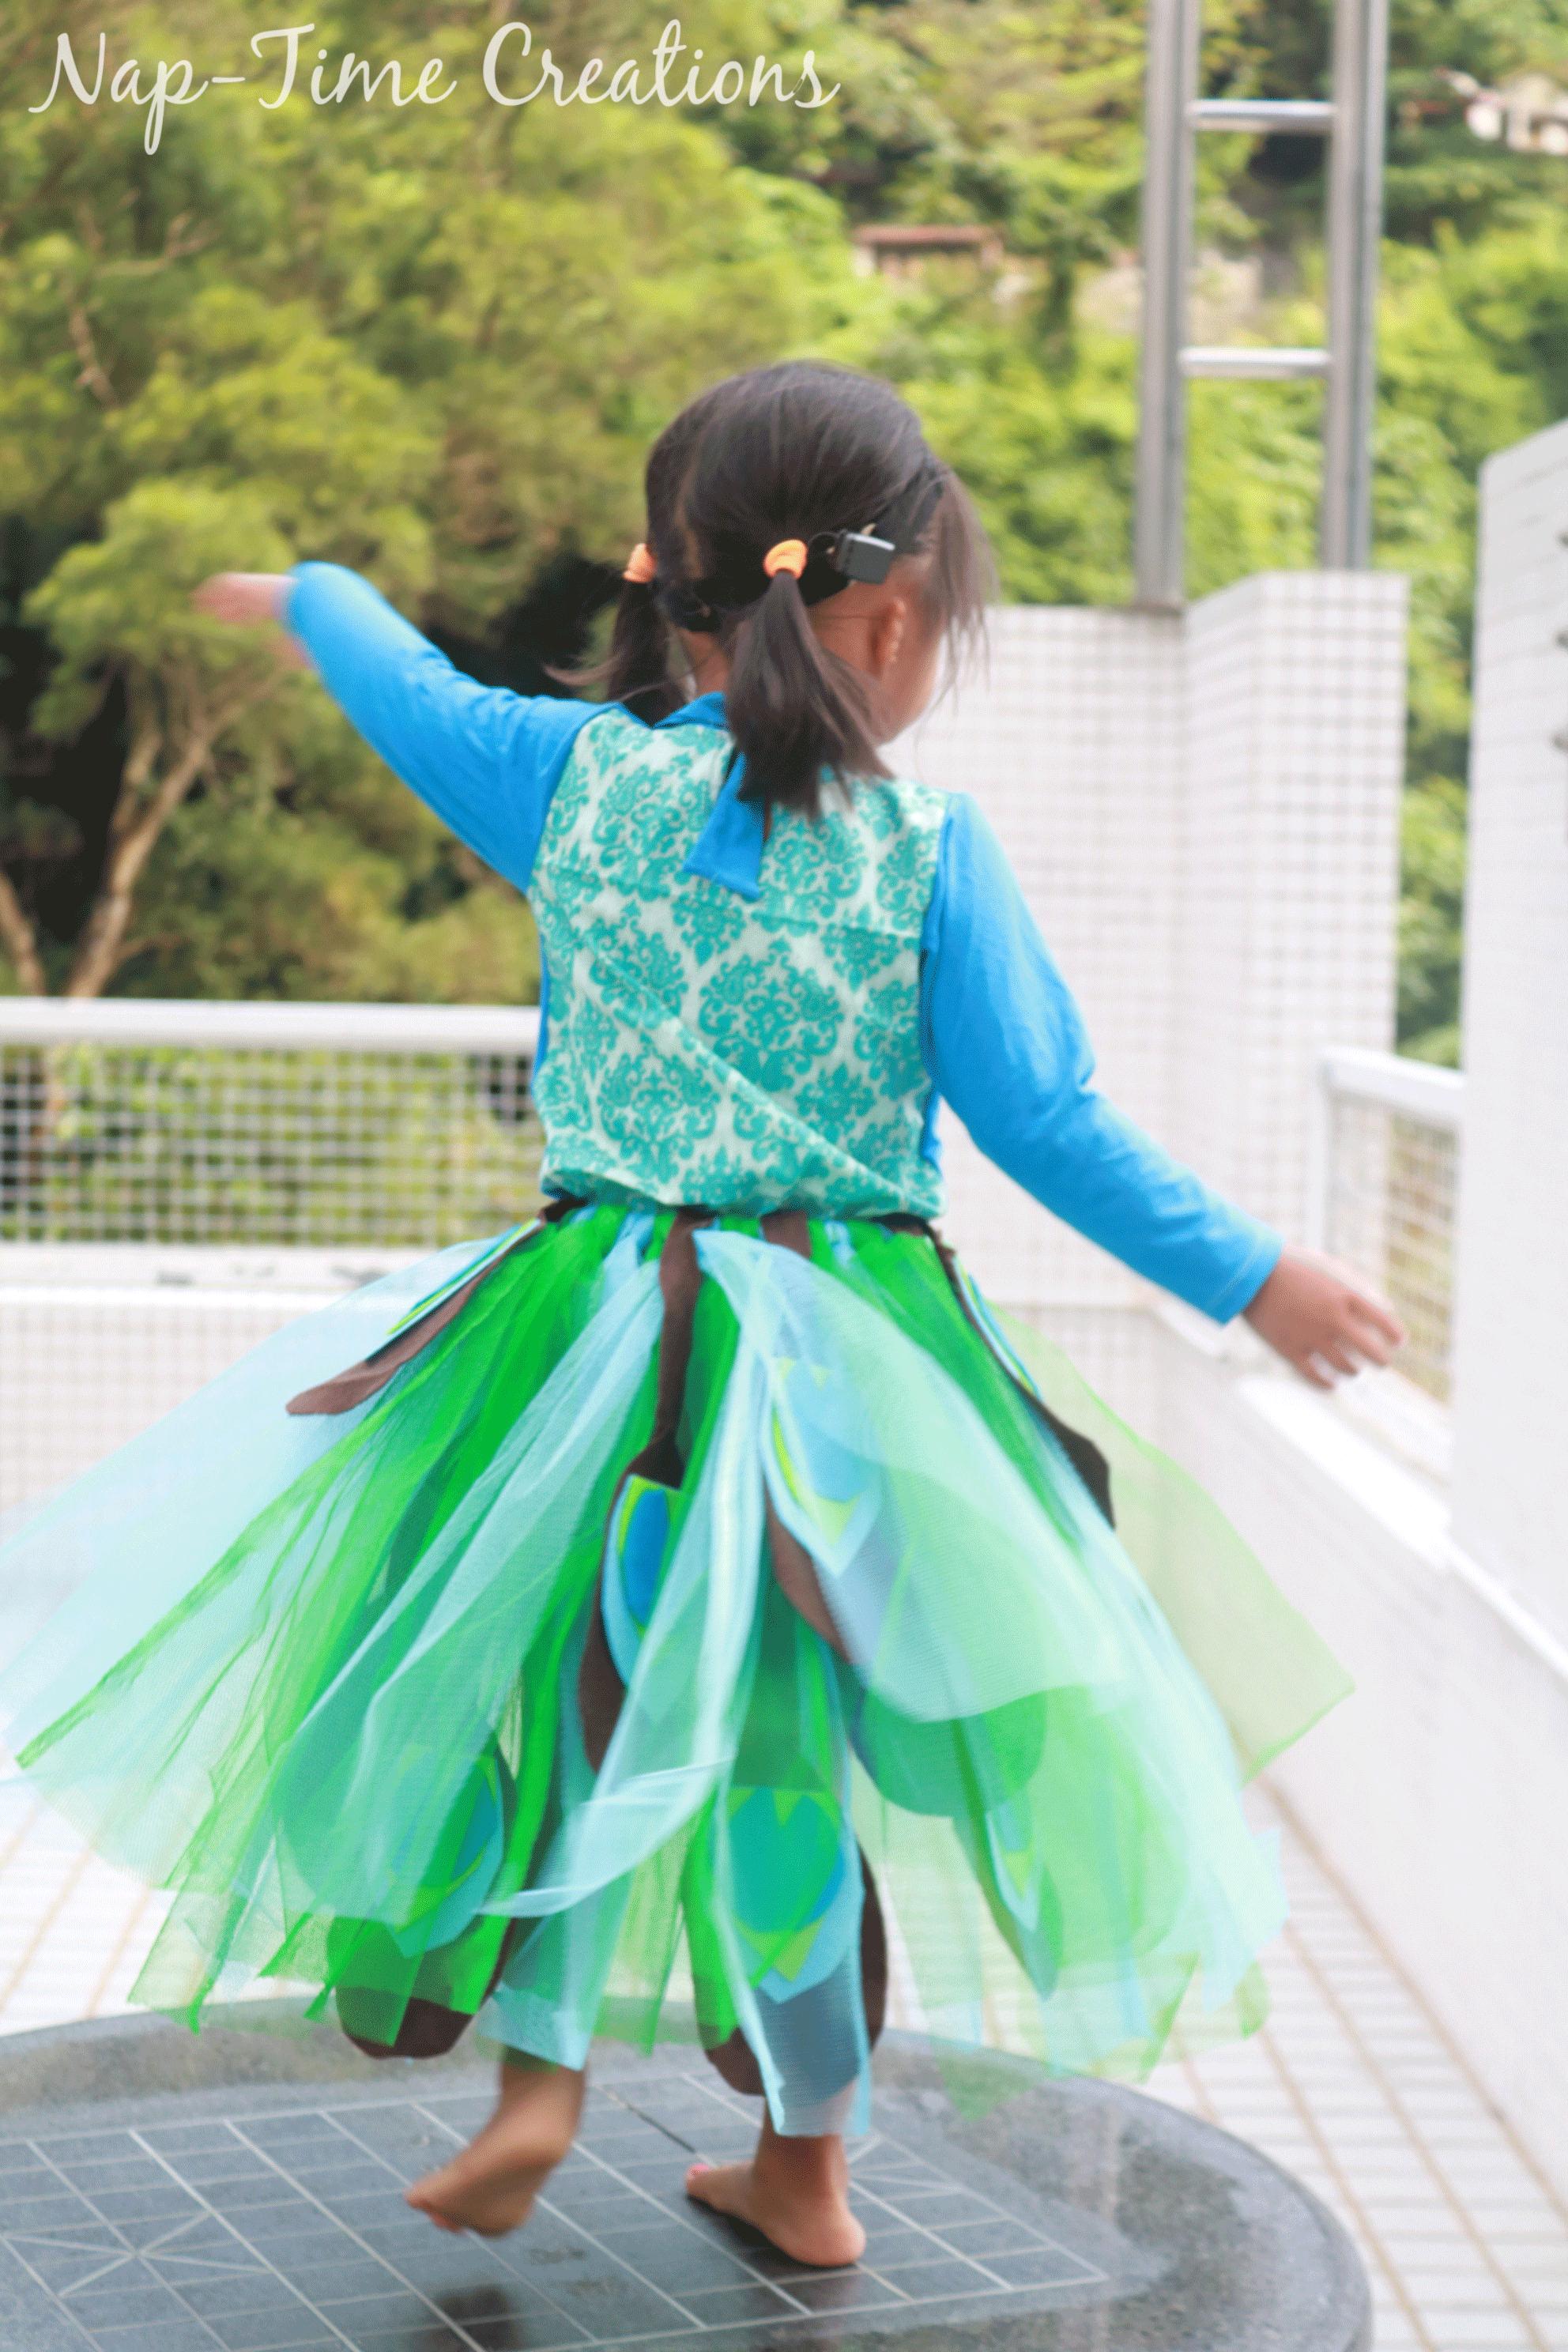 peacock-tutu-skirt-1